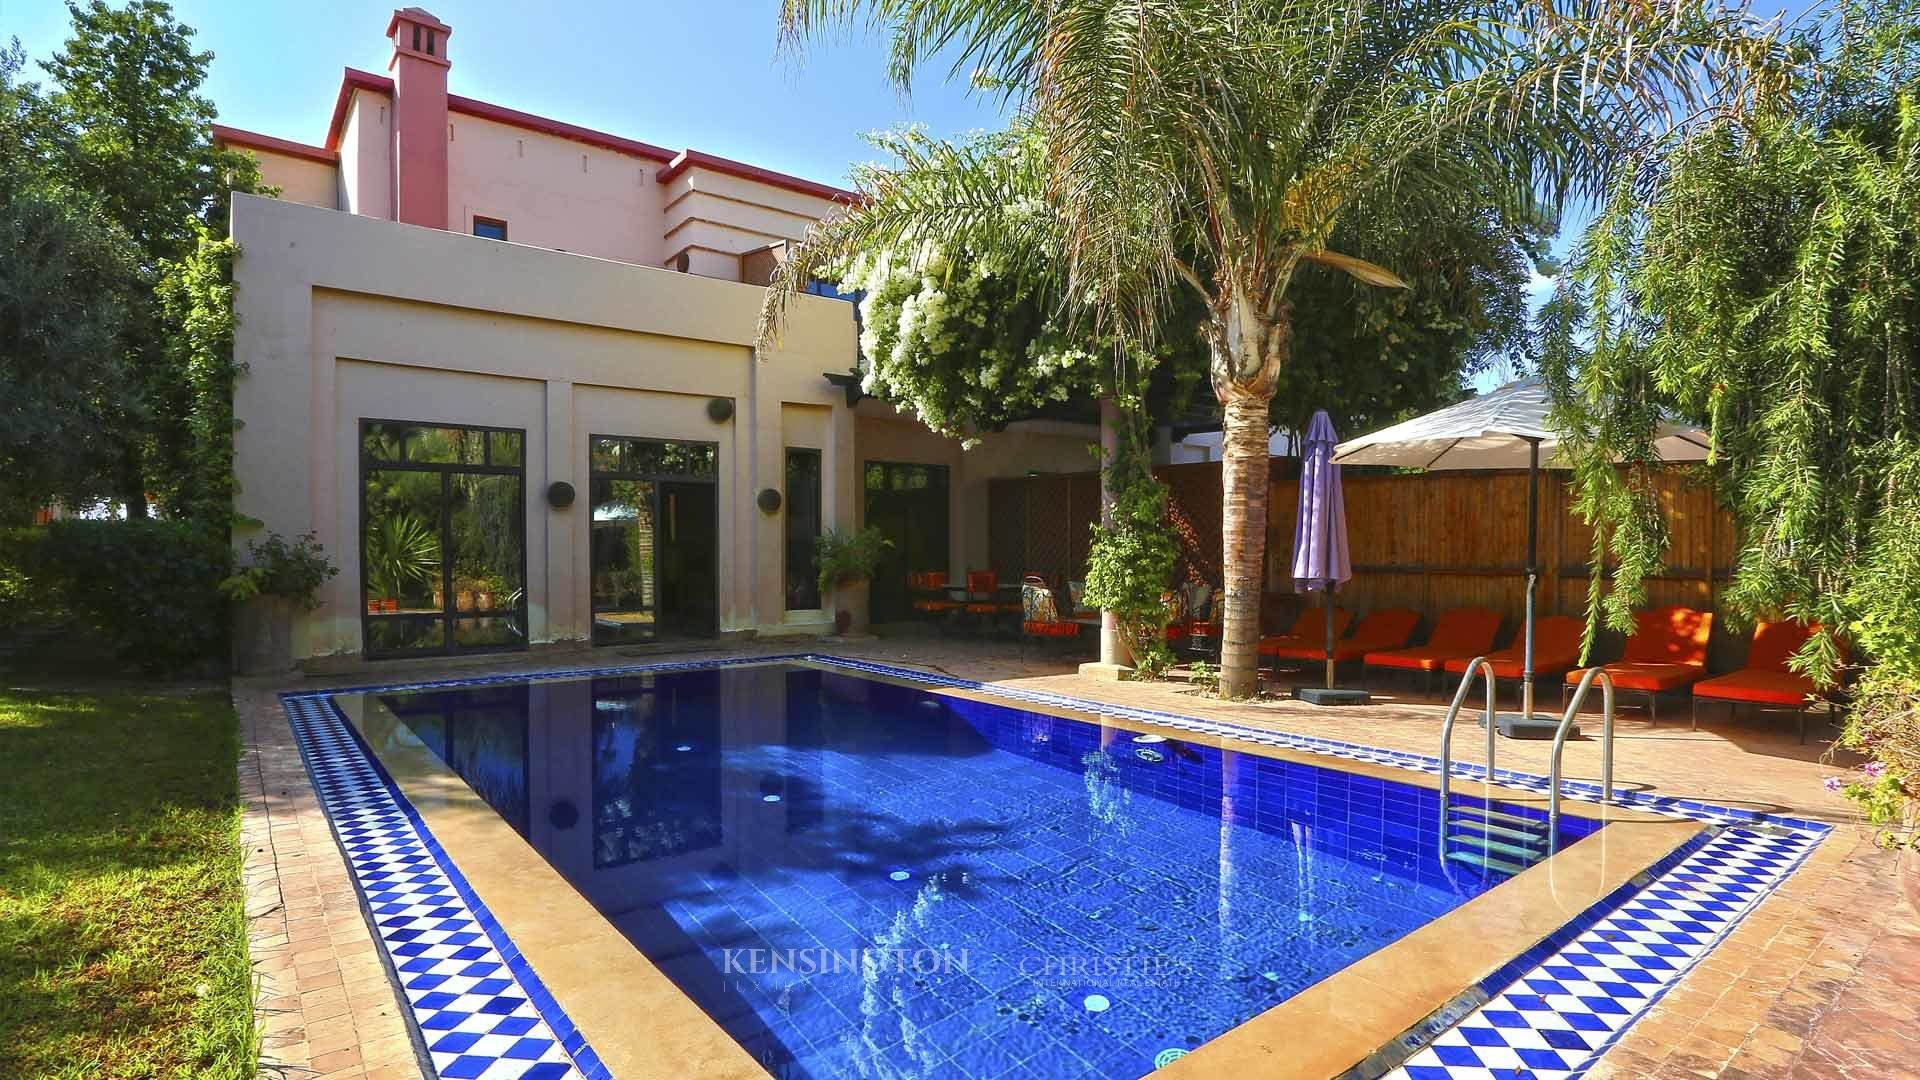 KPPM01302: Villa Paola Luxury Villa Marrakech Morocco